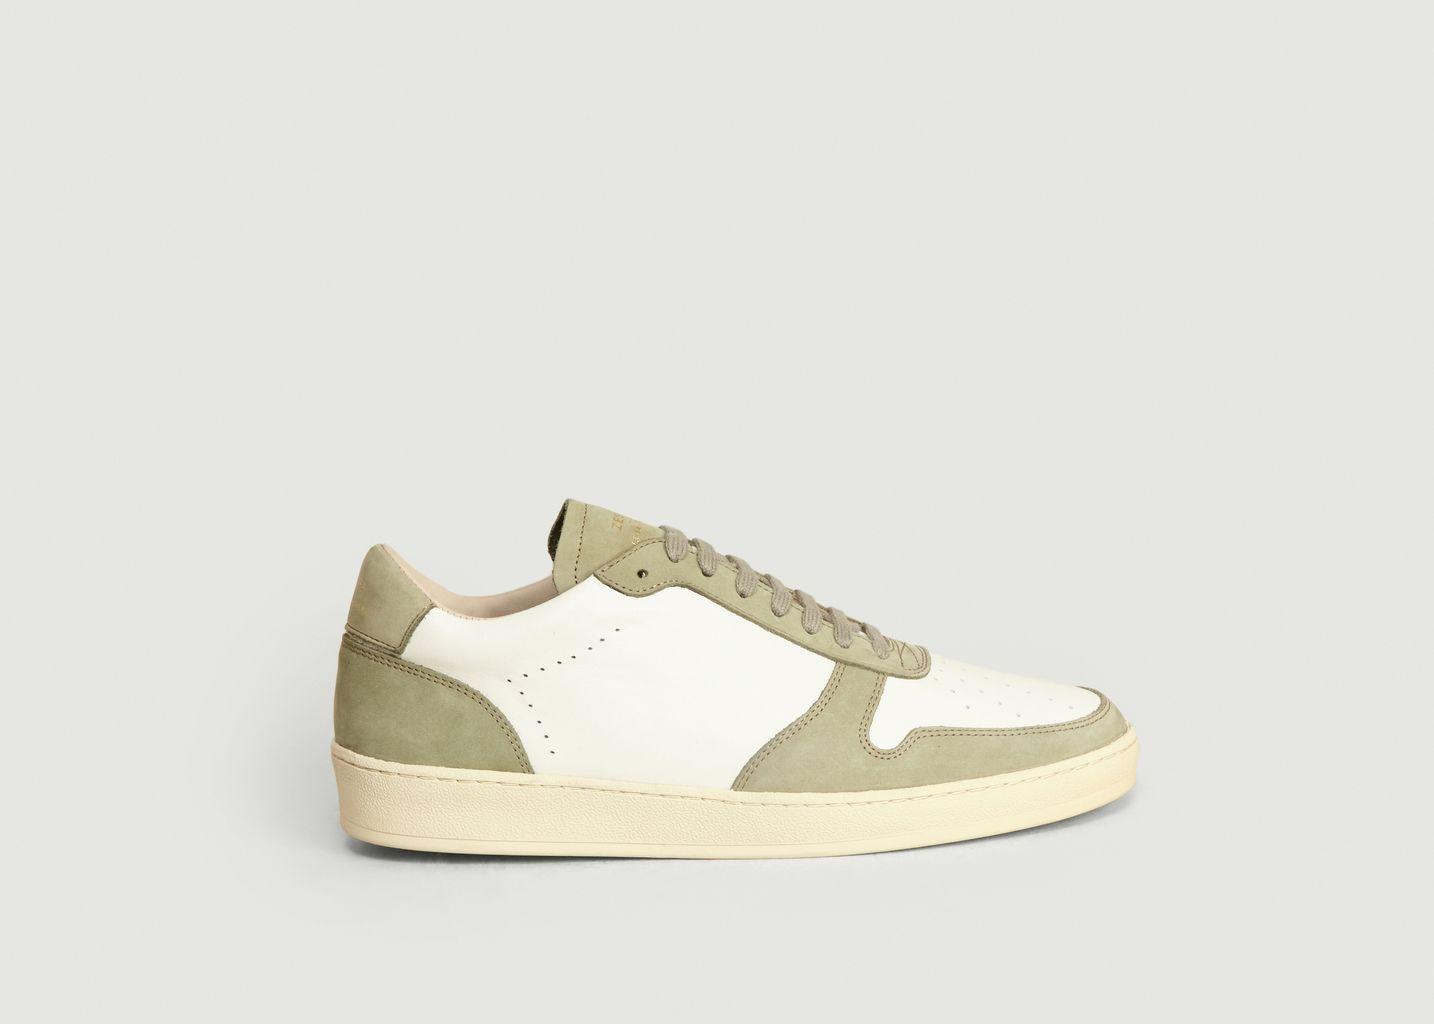 Sneakers ZSP23 Cuir Nappa - Zespa